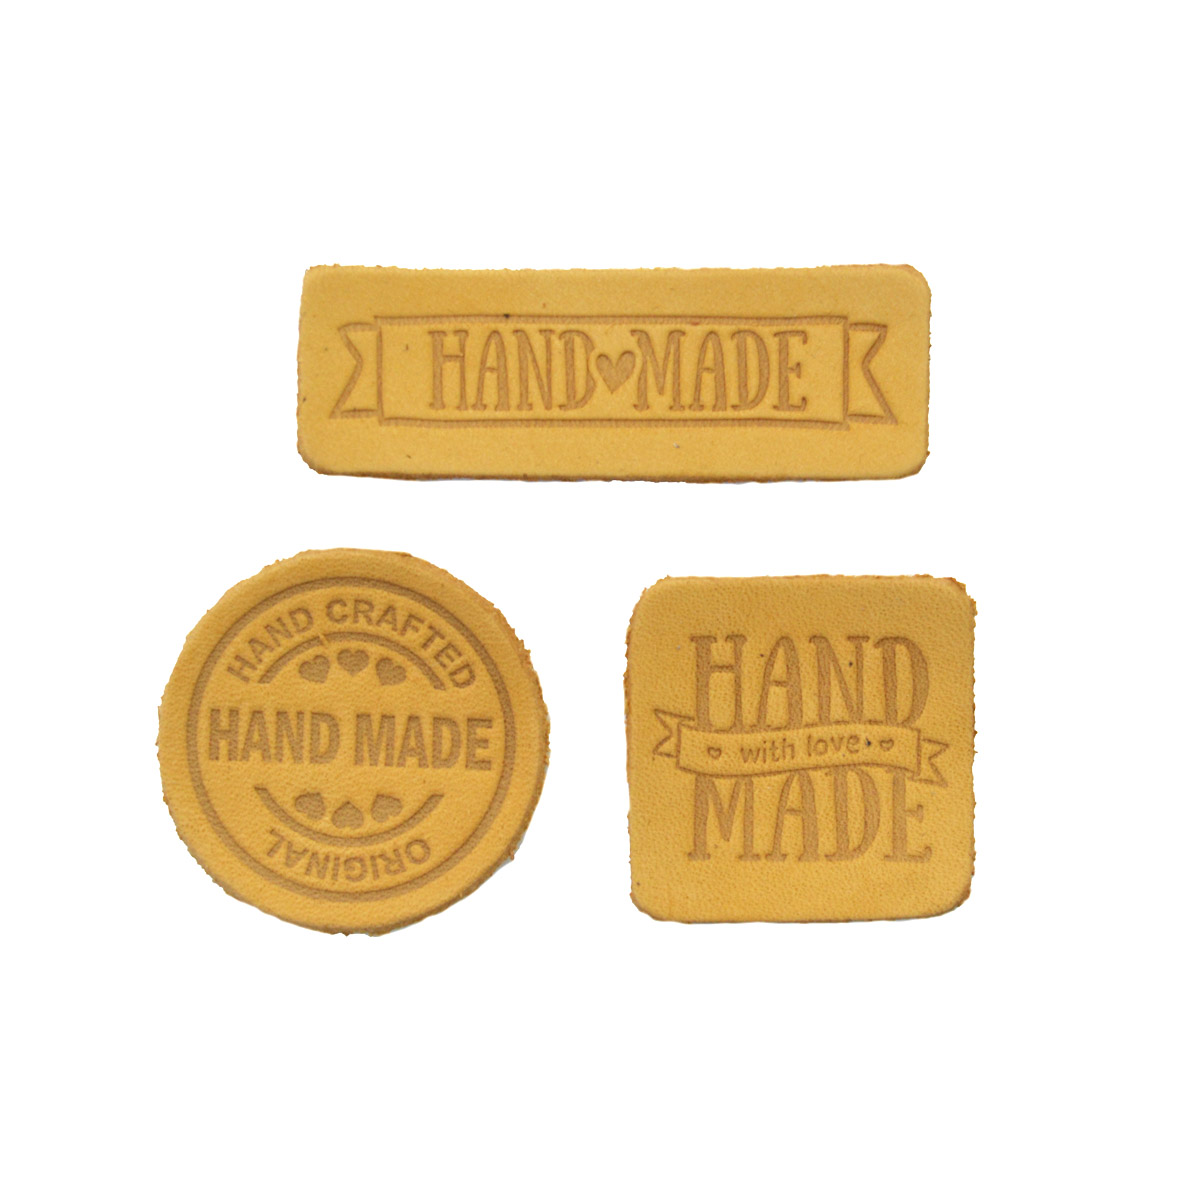 44 Набор термоаппликаций Hand Made из кожи: квадр.№5 - 1шт. круг№2 - 1шт. прямоуг.№3 - 1шт, 100%кожа